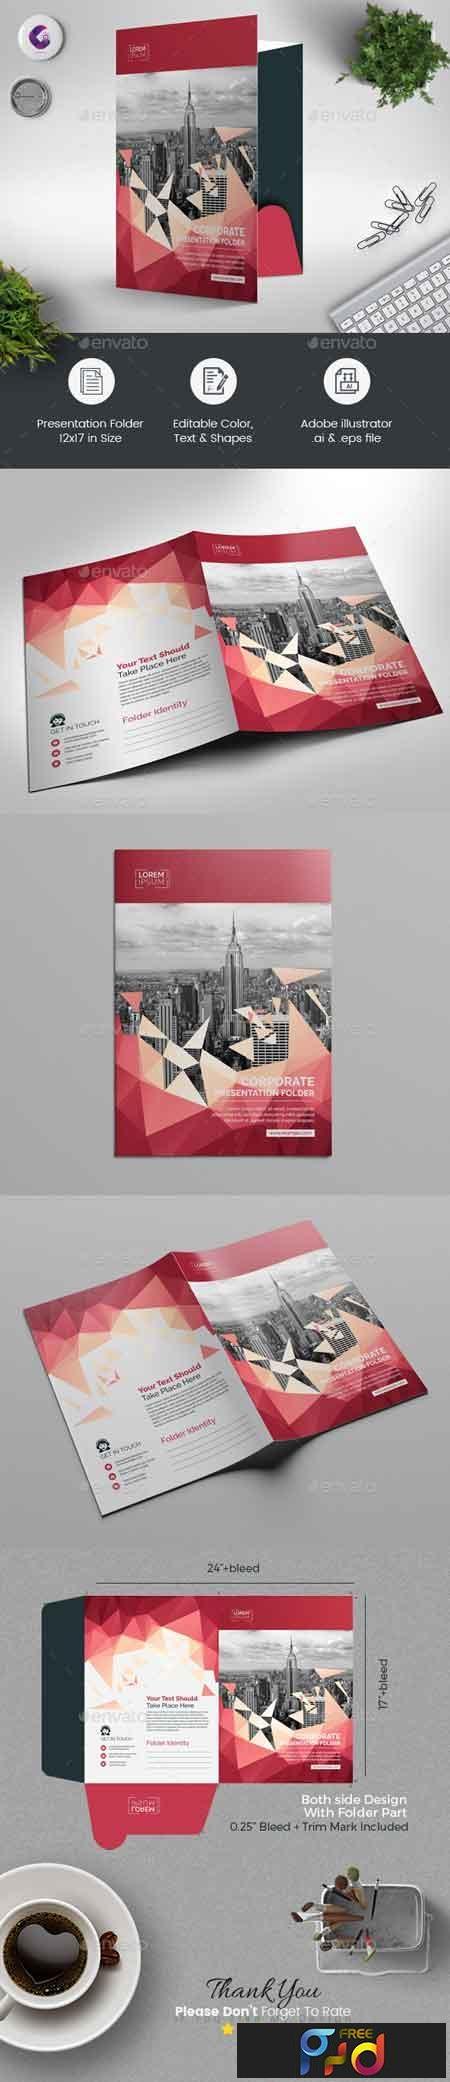 Abstract Presentation Folder 22647491 1